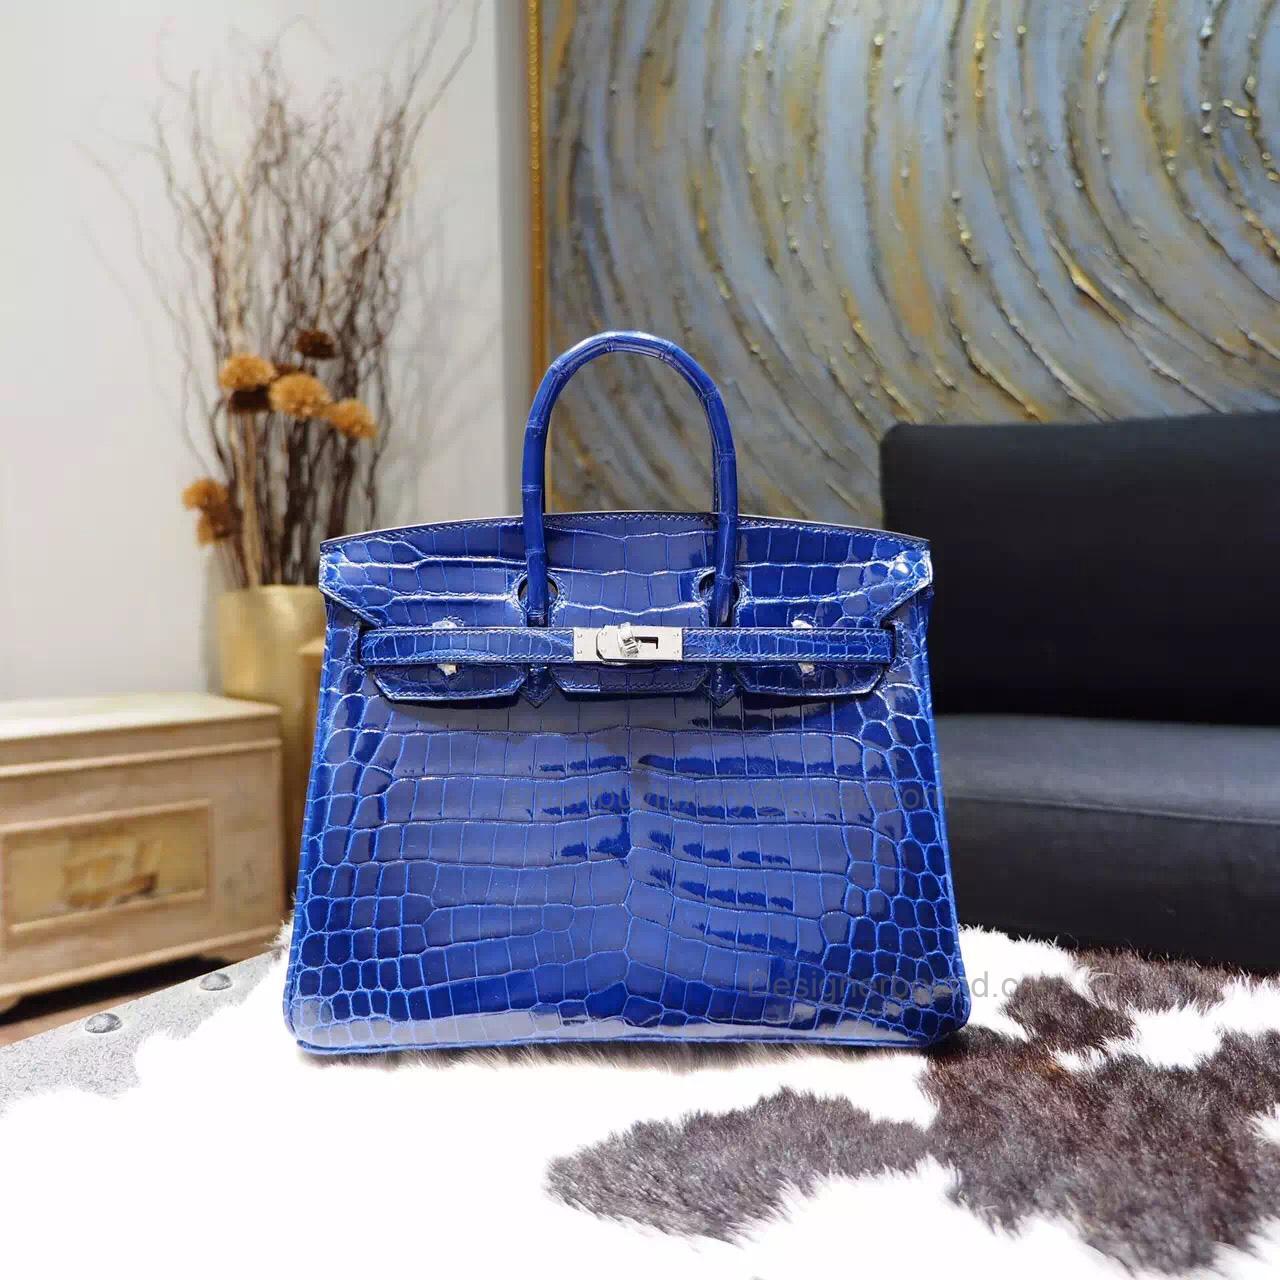 fc7d0b287a Hand Stitched Hermes Birkin 25 Bag in 7t Blue Electric Shining Nile Croc SHW